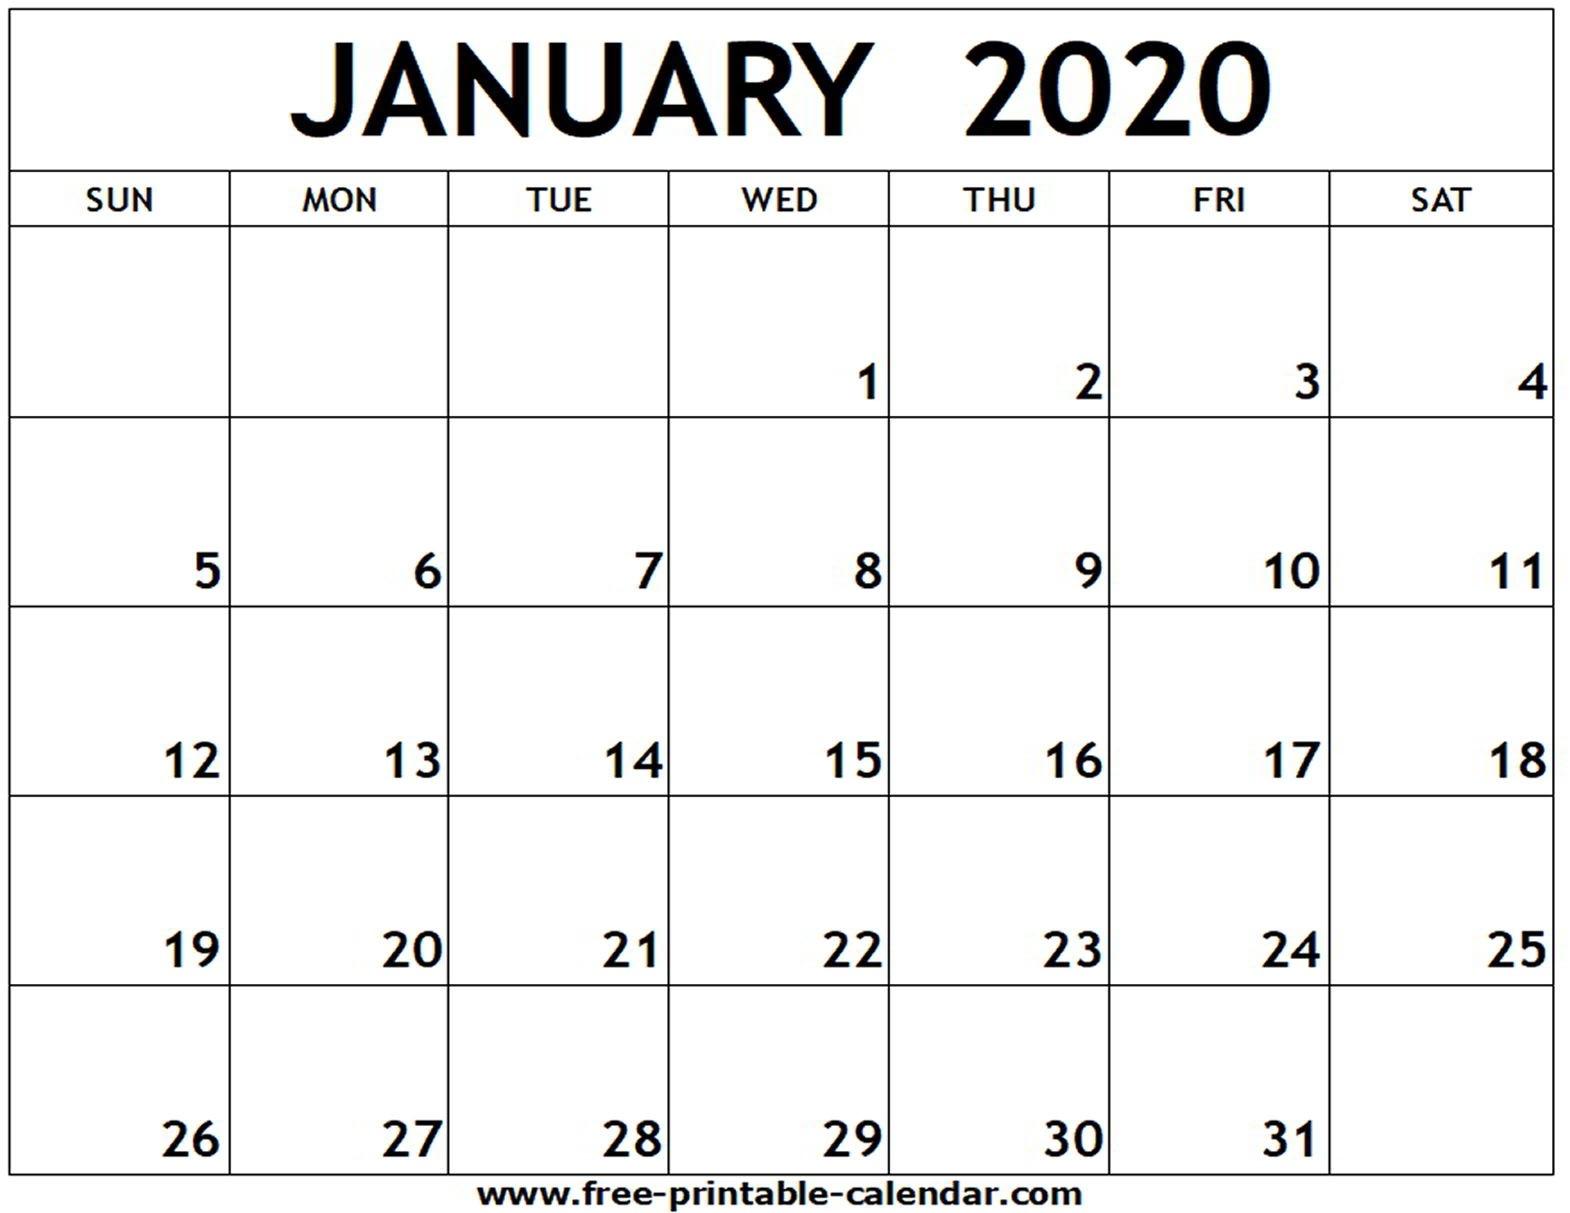 January 2020 Printable Calendar - Free-Printable-Calendar-January 2020 Calendar Template